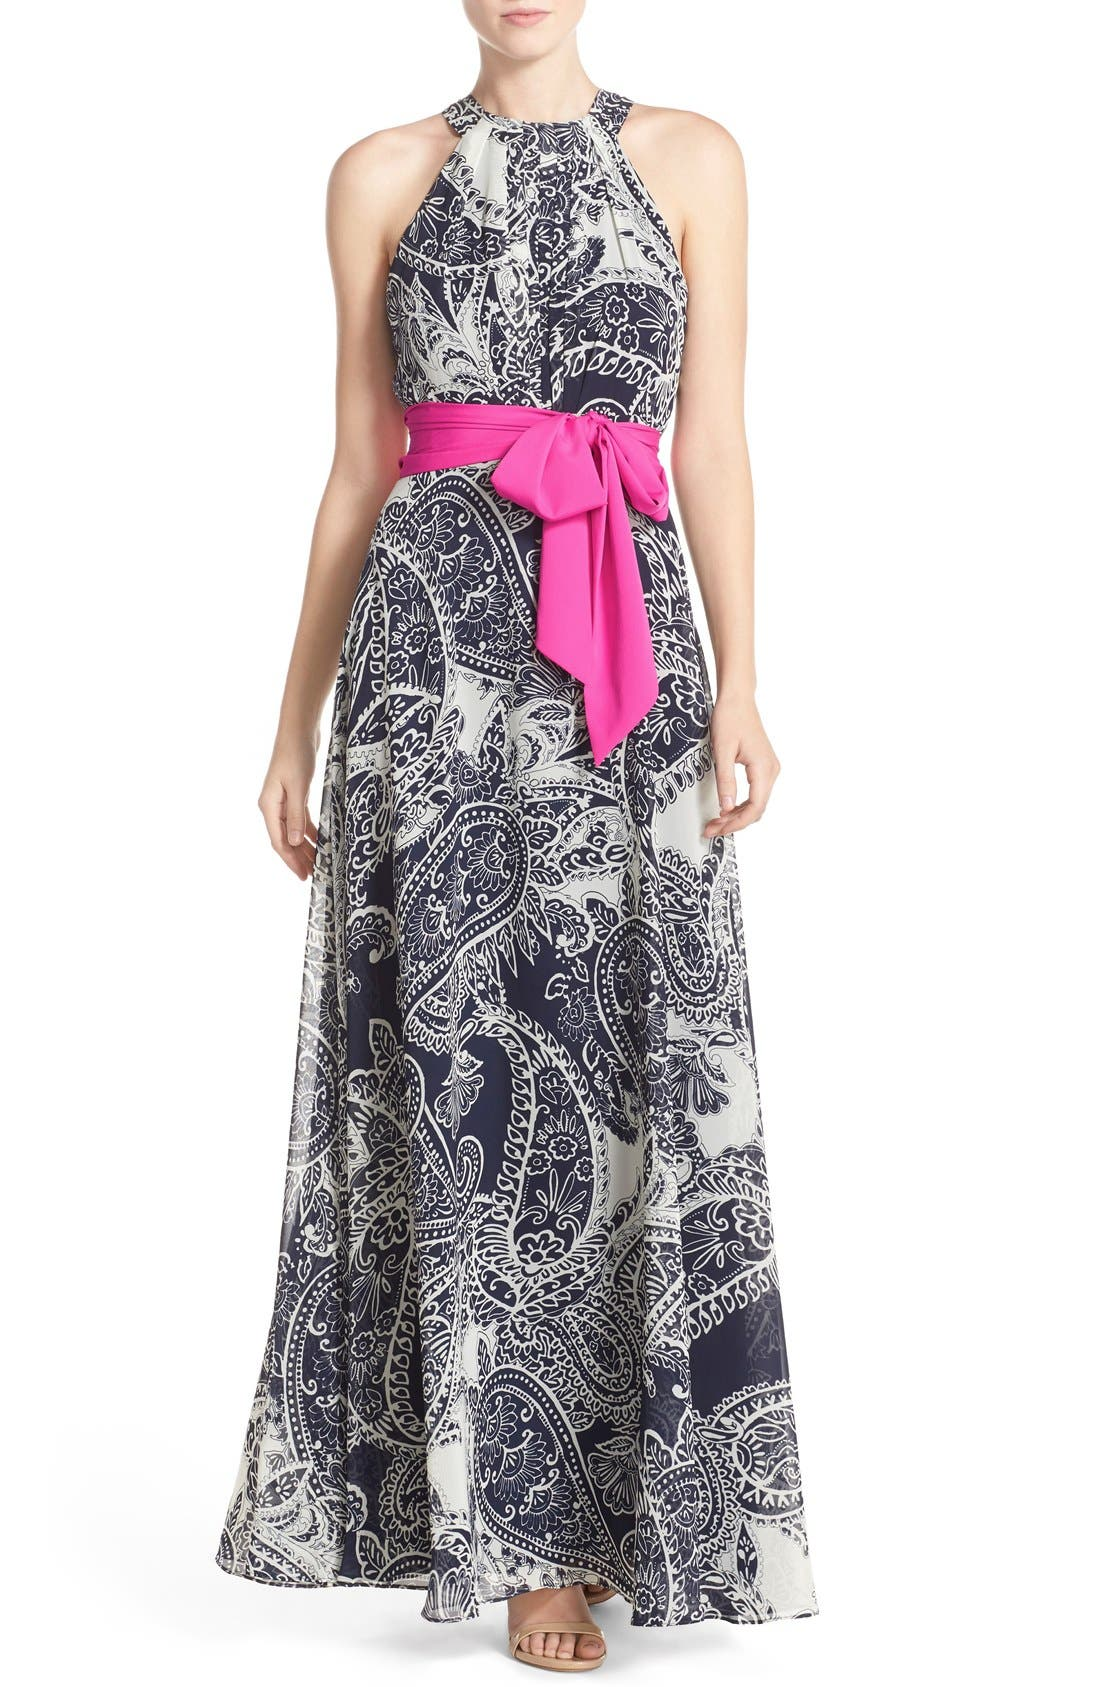 Alternate Image 1 Selected - Eliza J Print Chiffon Maxi Dress